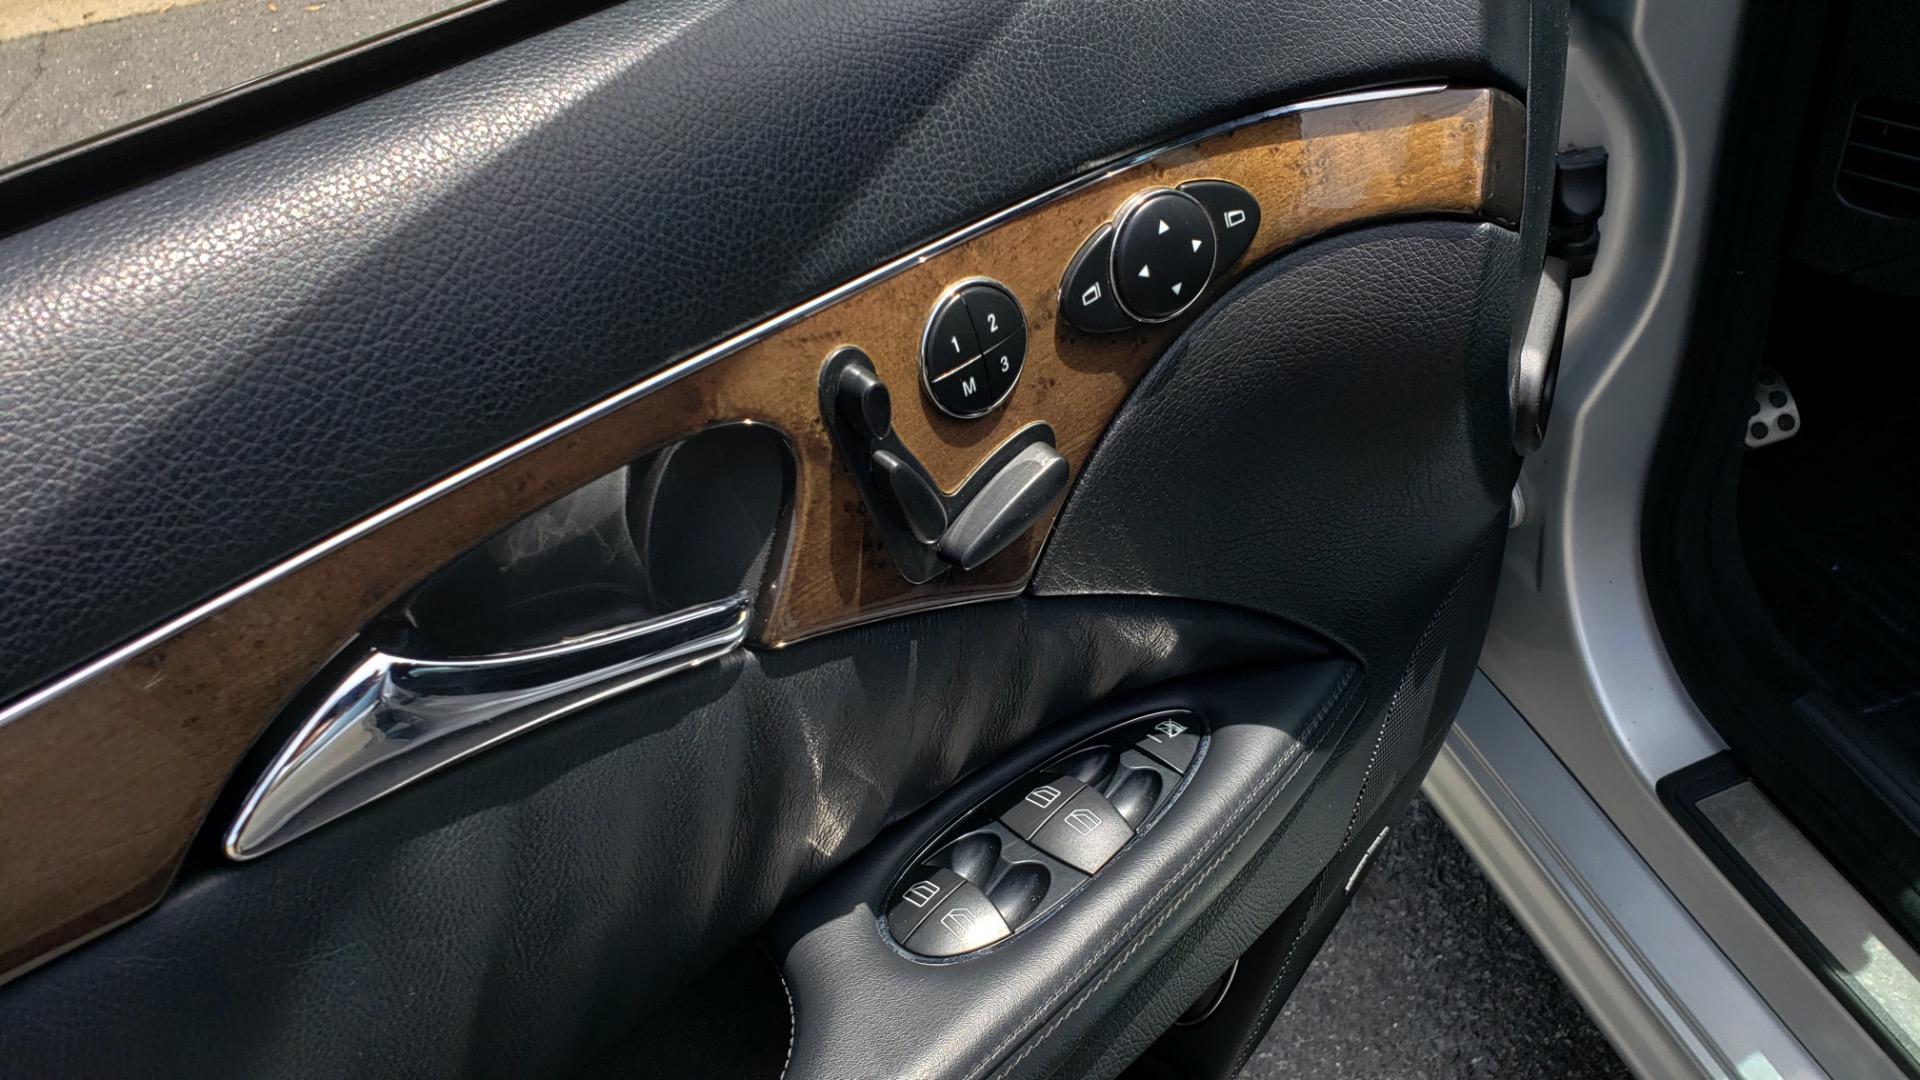 Used 2007 Mercedes-Benz E-Class E63 AMG WAGON / NAV / SUNROOF / HARMAN/KARDON for sale $29,000 at Formula Imports in Charlotte NC 28227 40